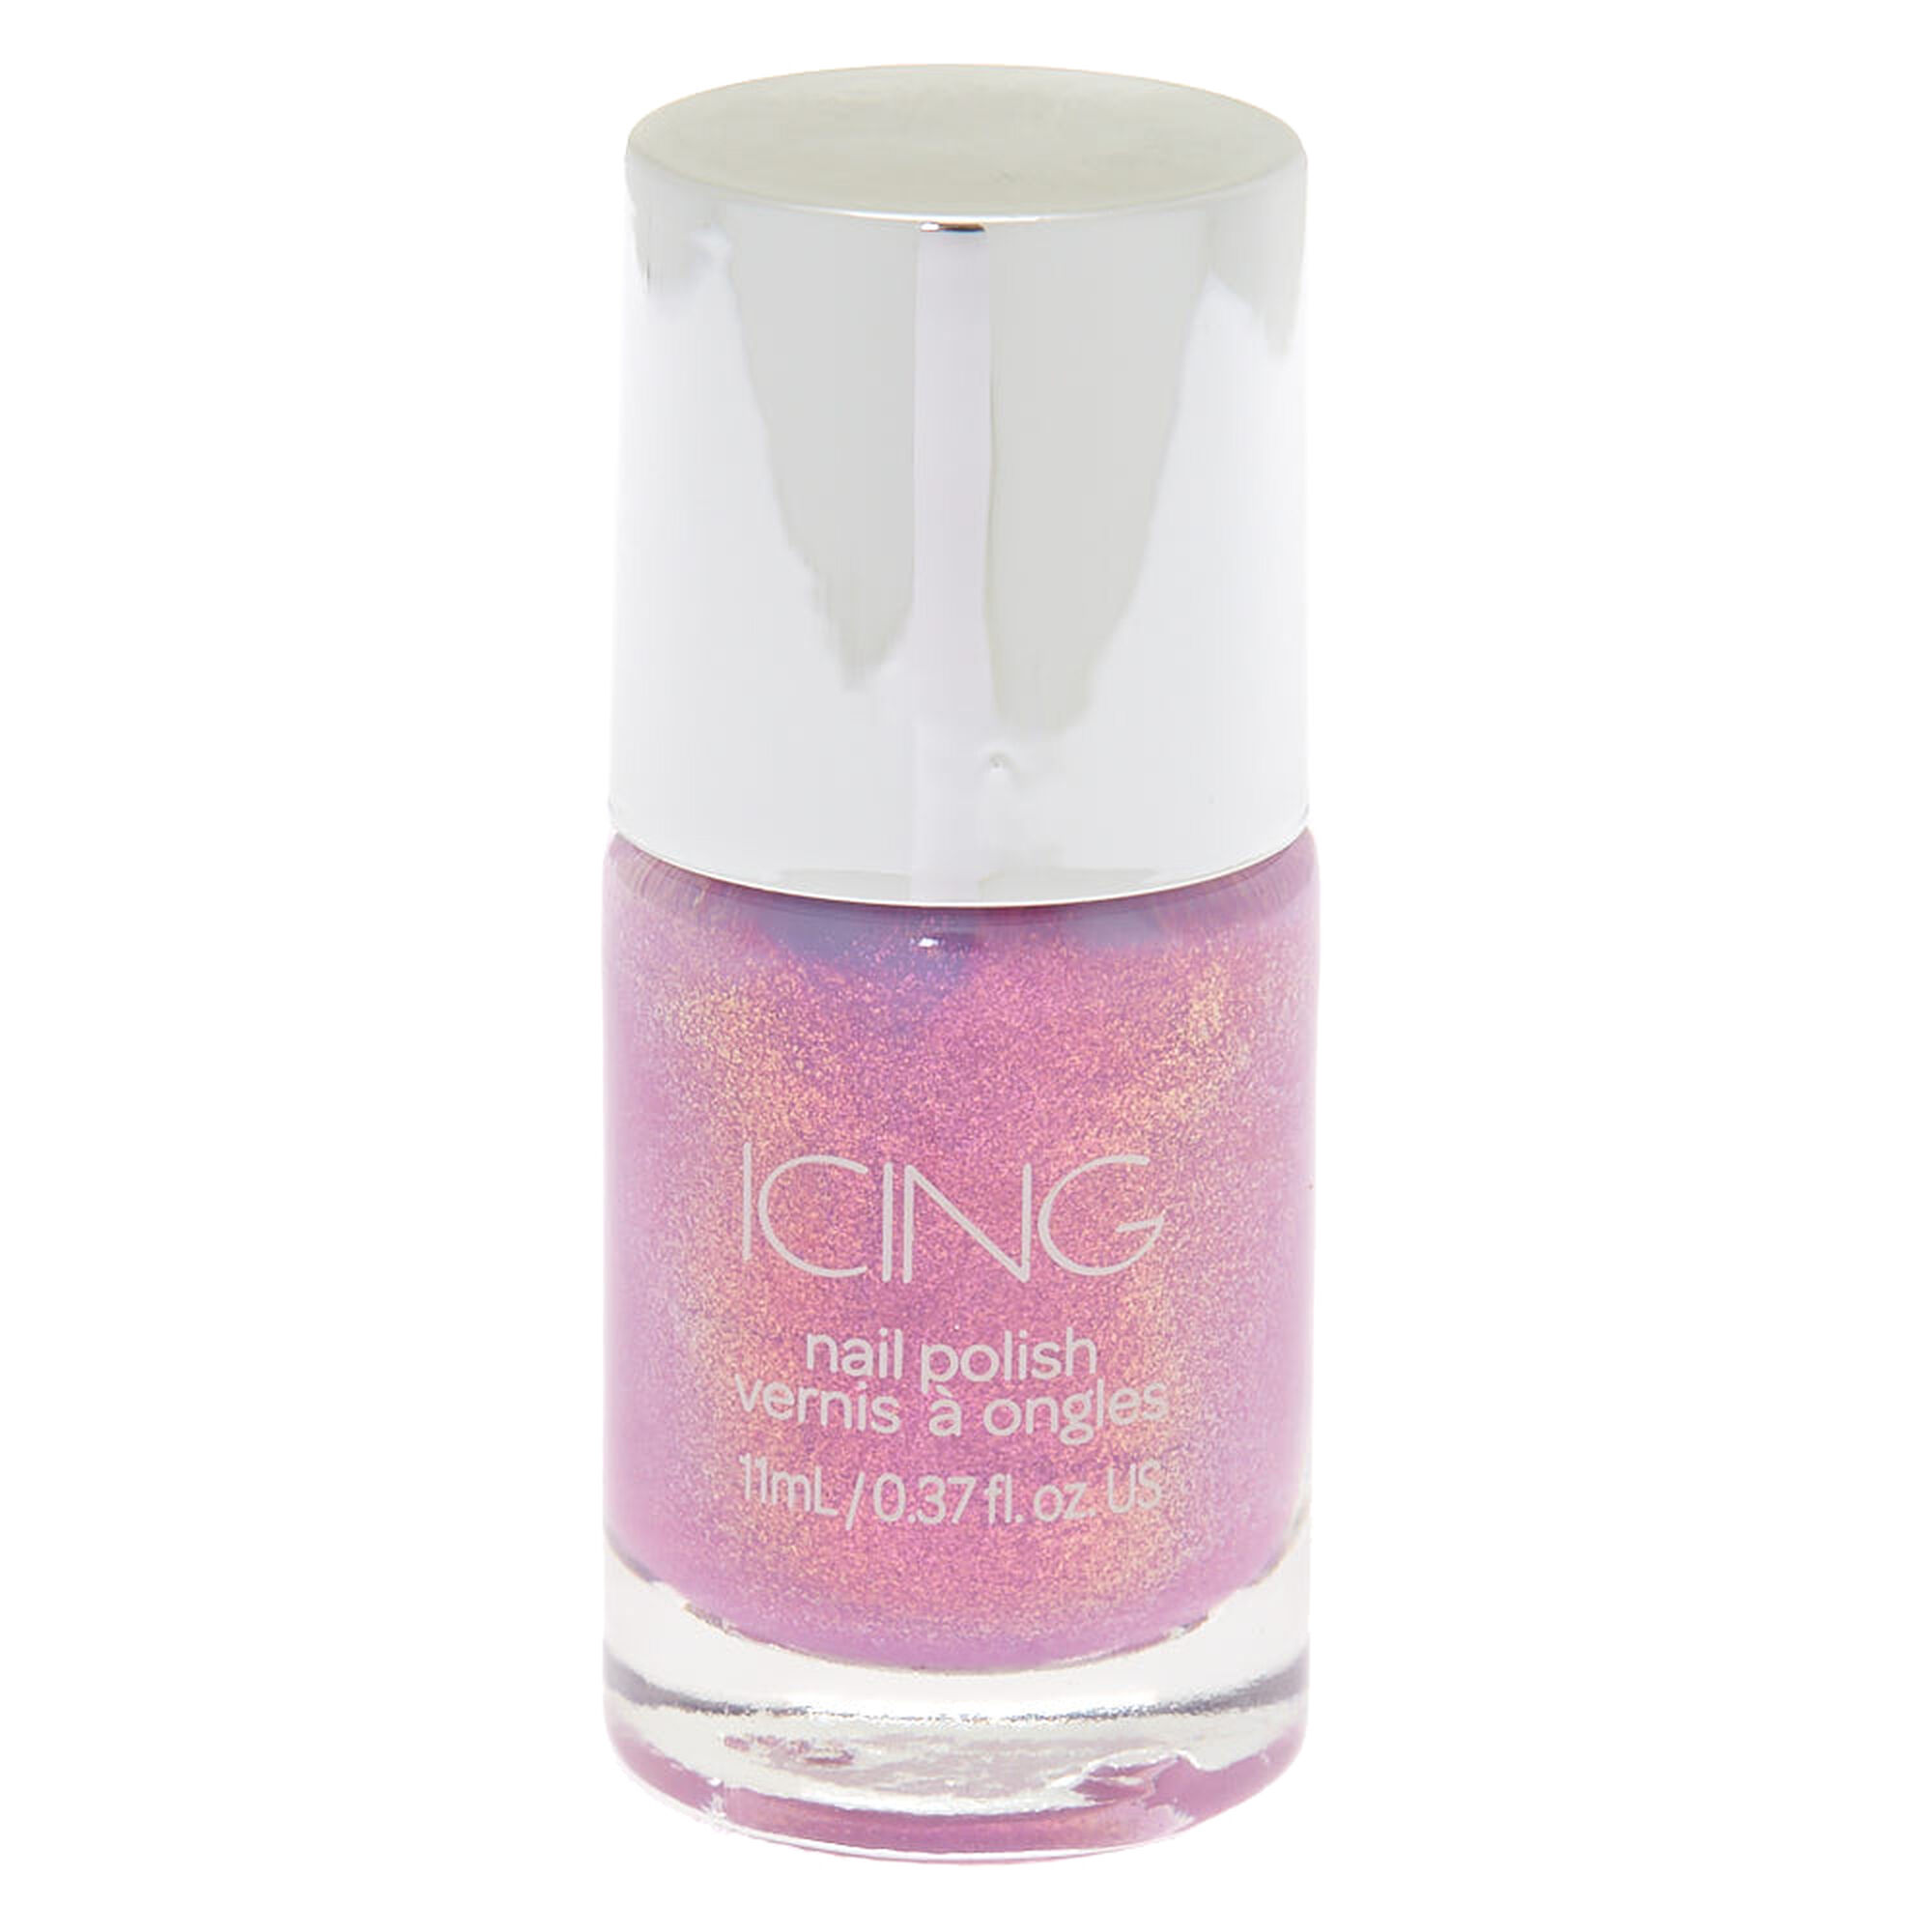 Shimmer Nail Polish - Purple Holo Glitter | Icing US